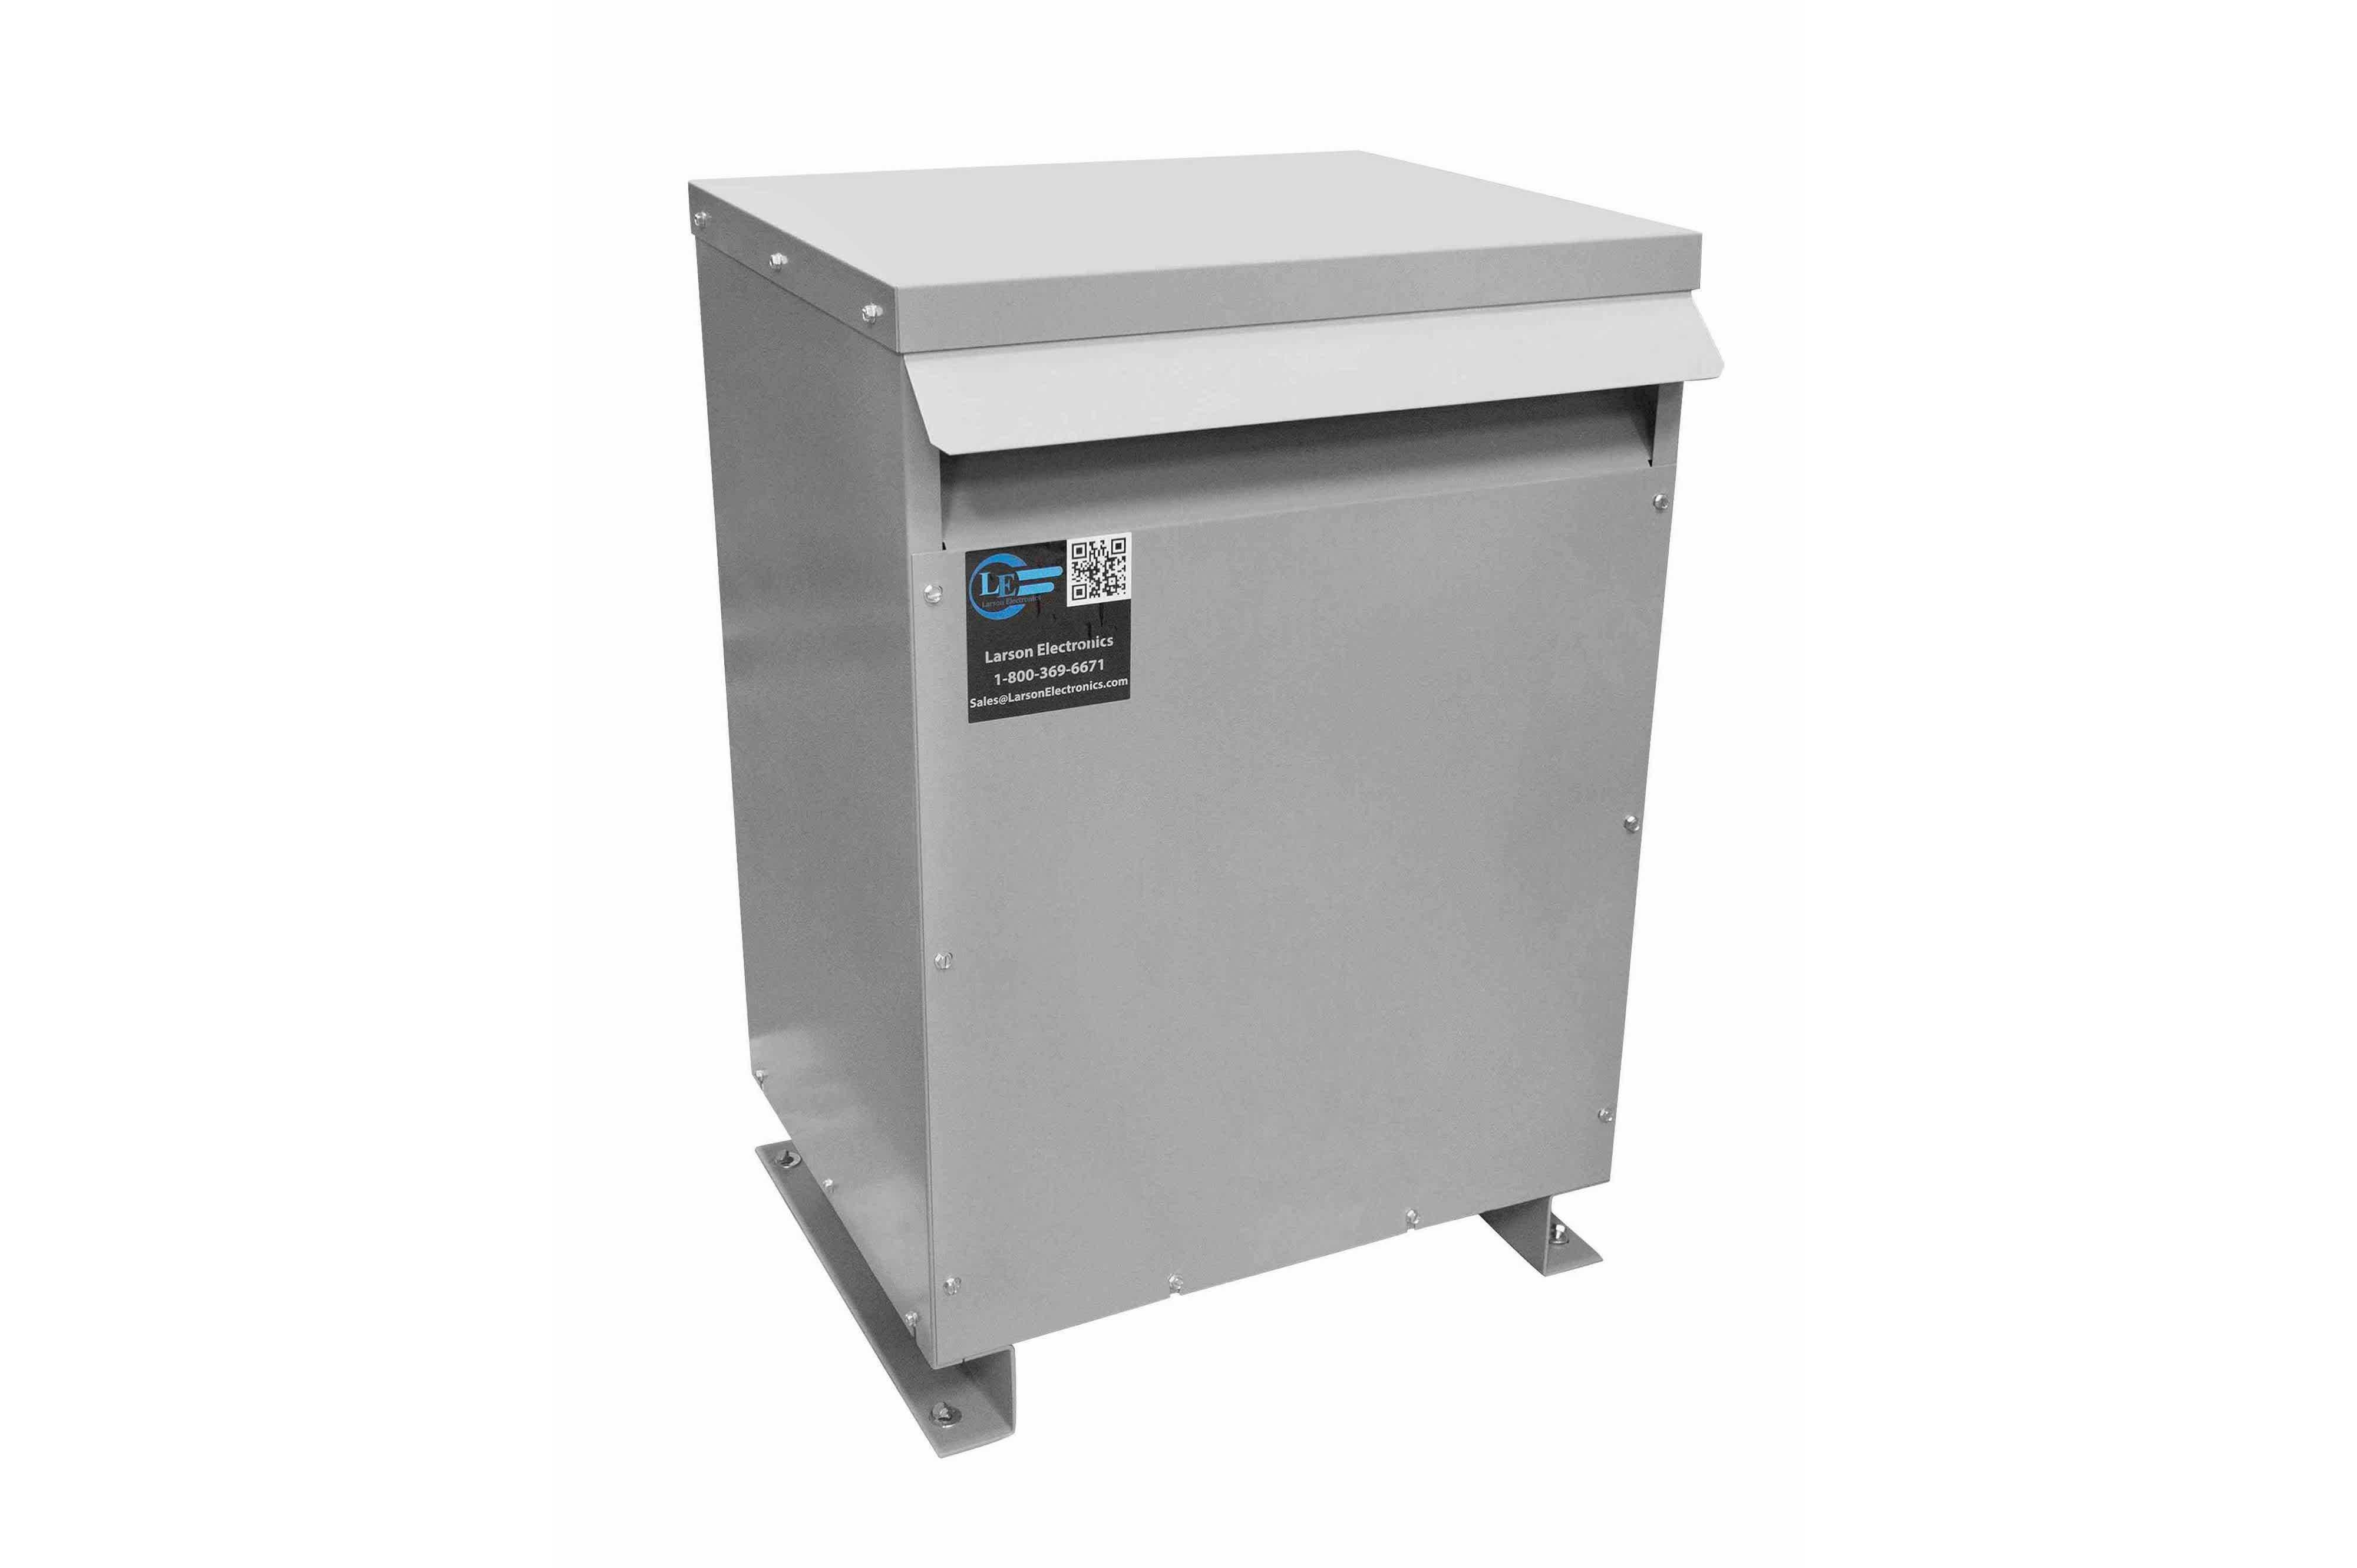 25 kVA 3PH Isolation Transformer, 575V Wye Primary, 415V Delta Secondary, N3R, Ventilated, 60 Hz